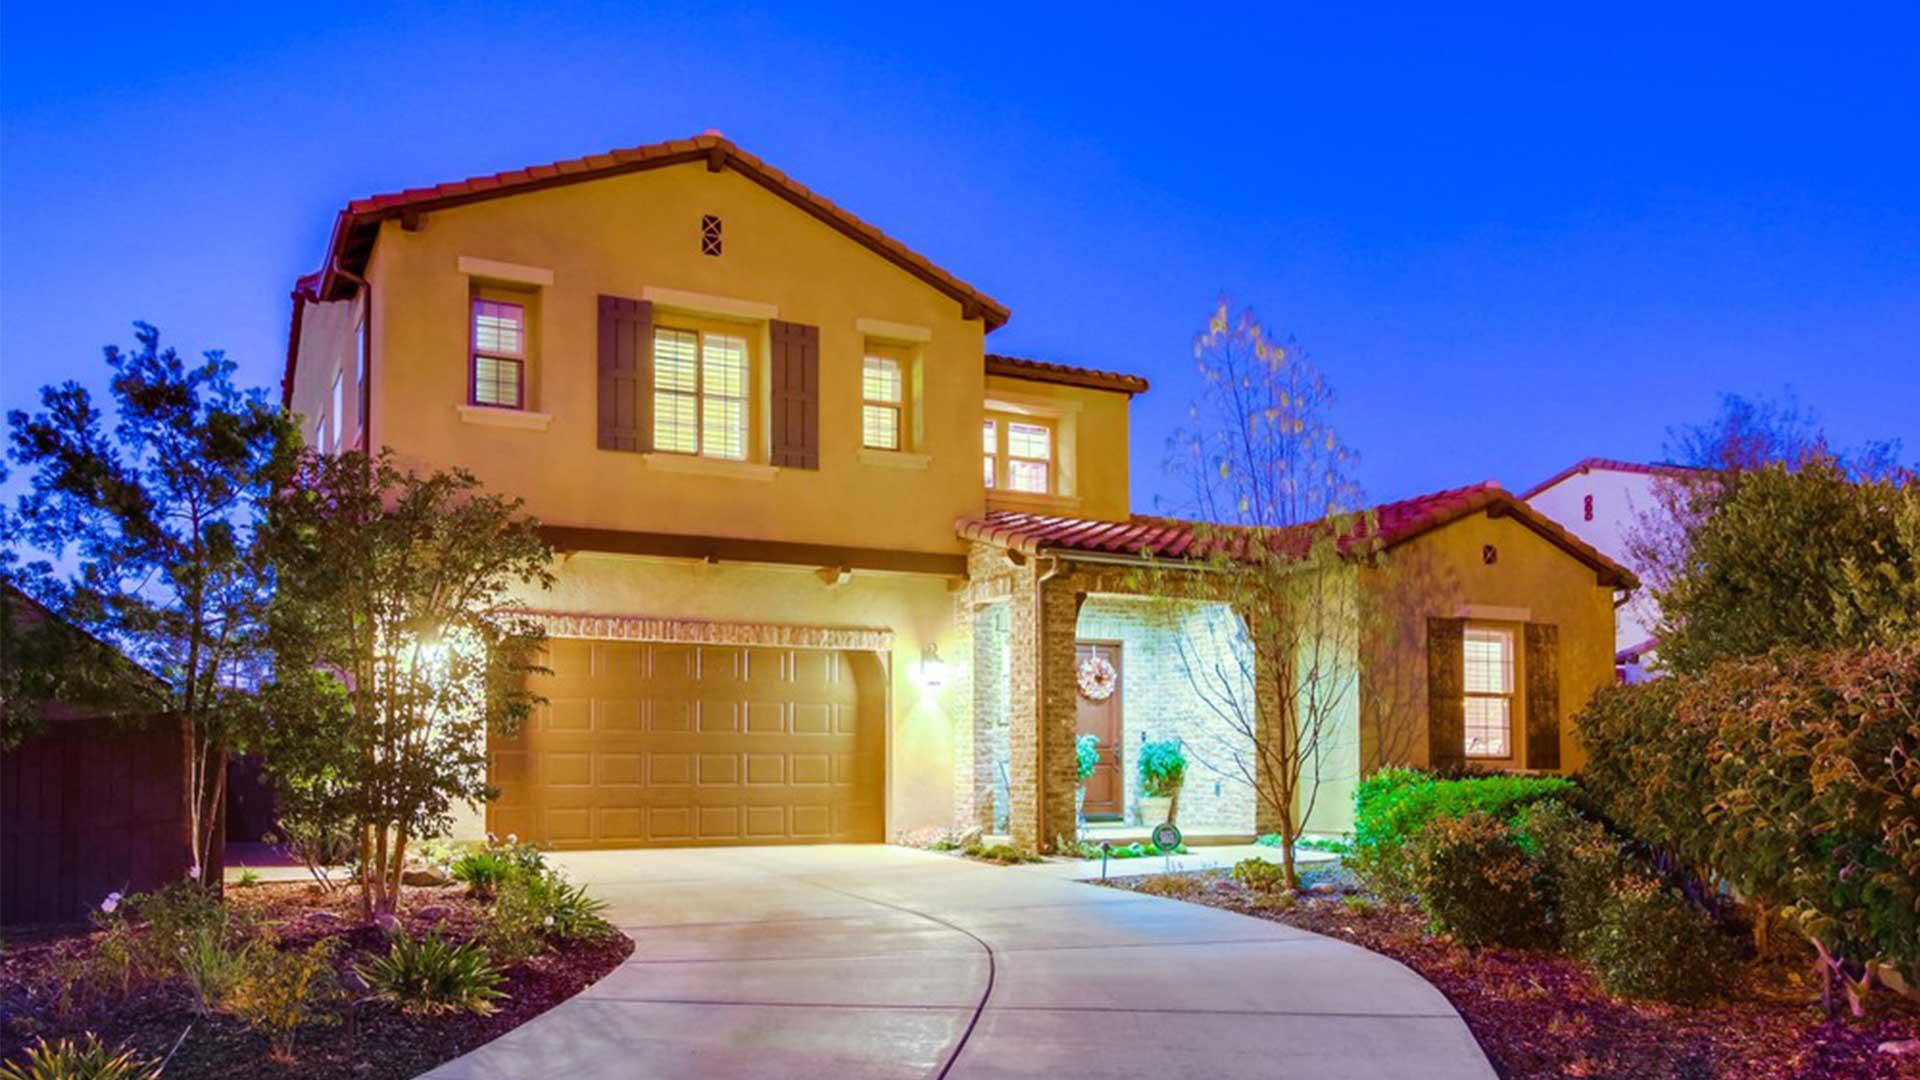 15541 Tanner Ridge Ct. San Diego, CA 92127